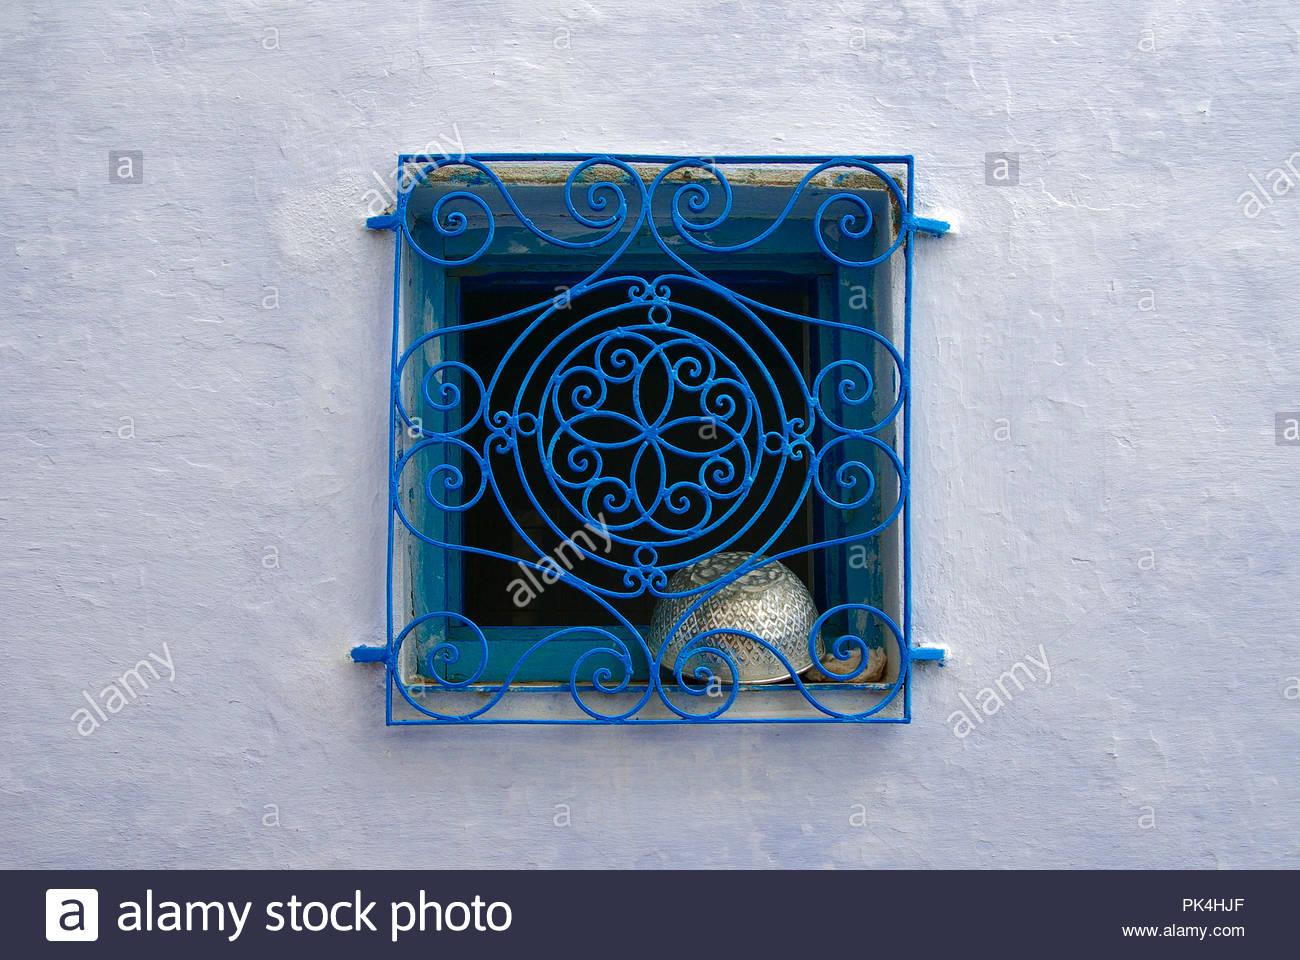 DECORATIVE WINDOW PROTECTION, HAMMAMET, TUNISIA - Stock Image